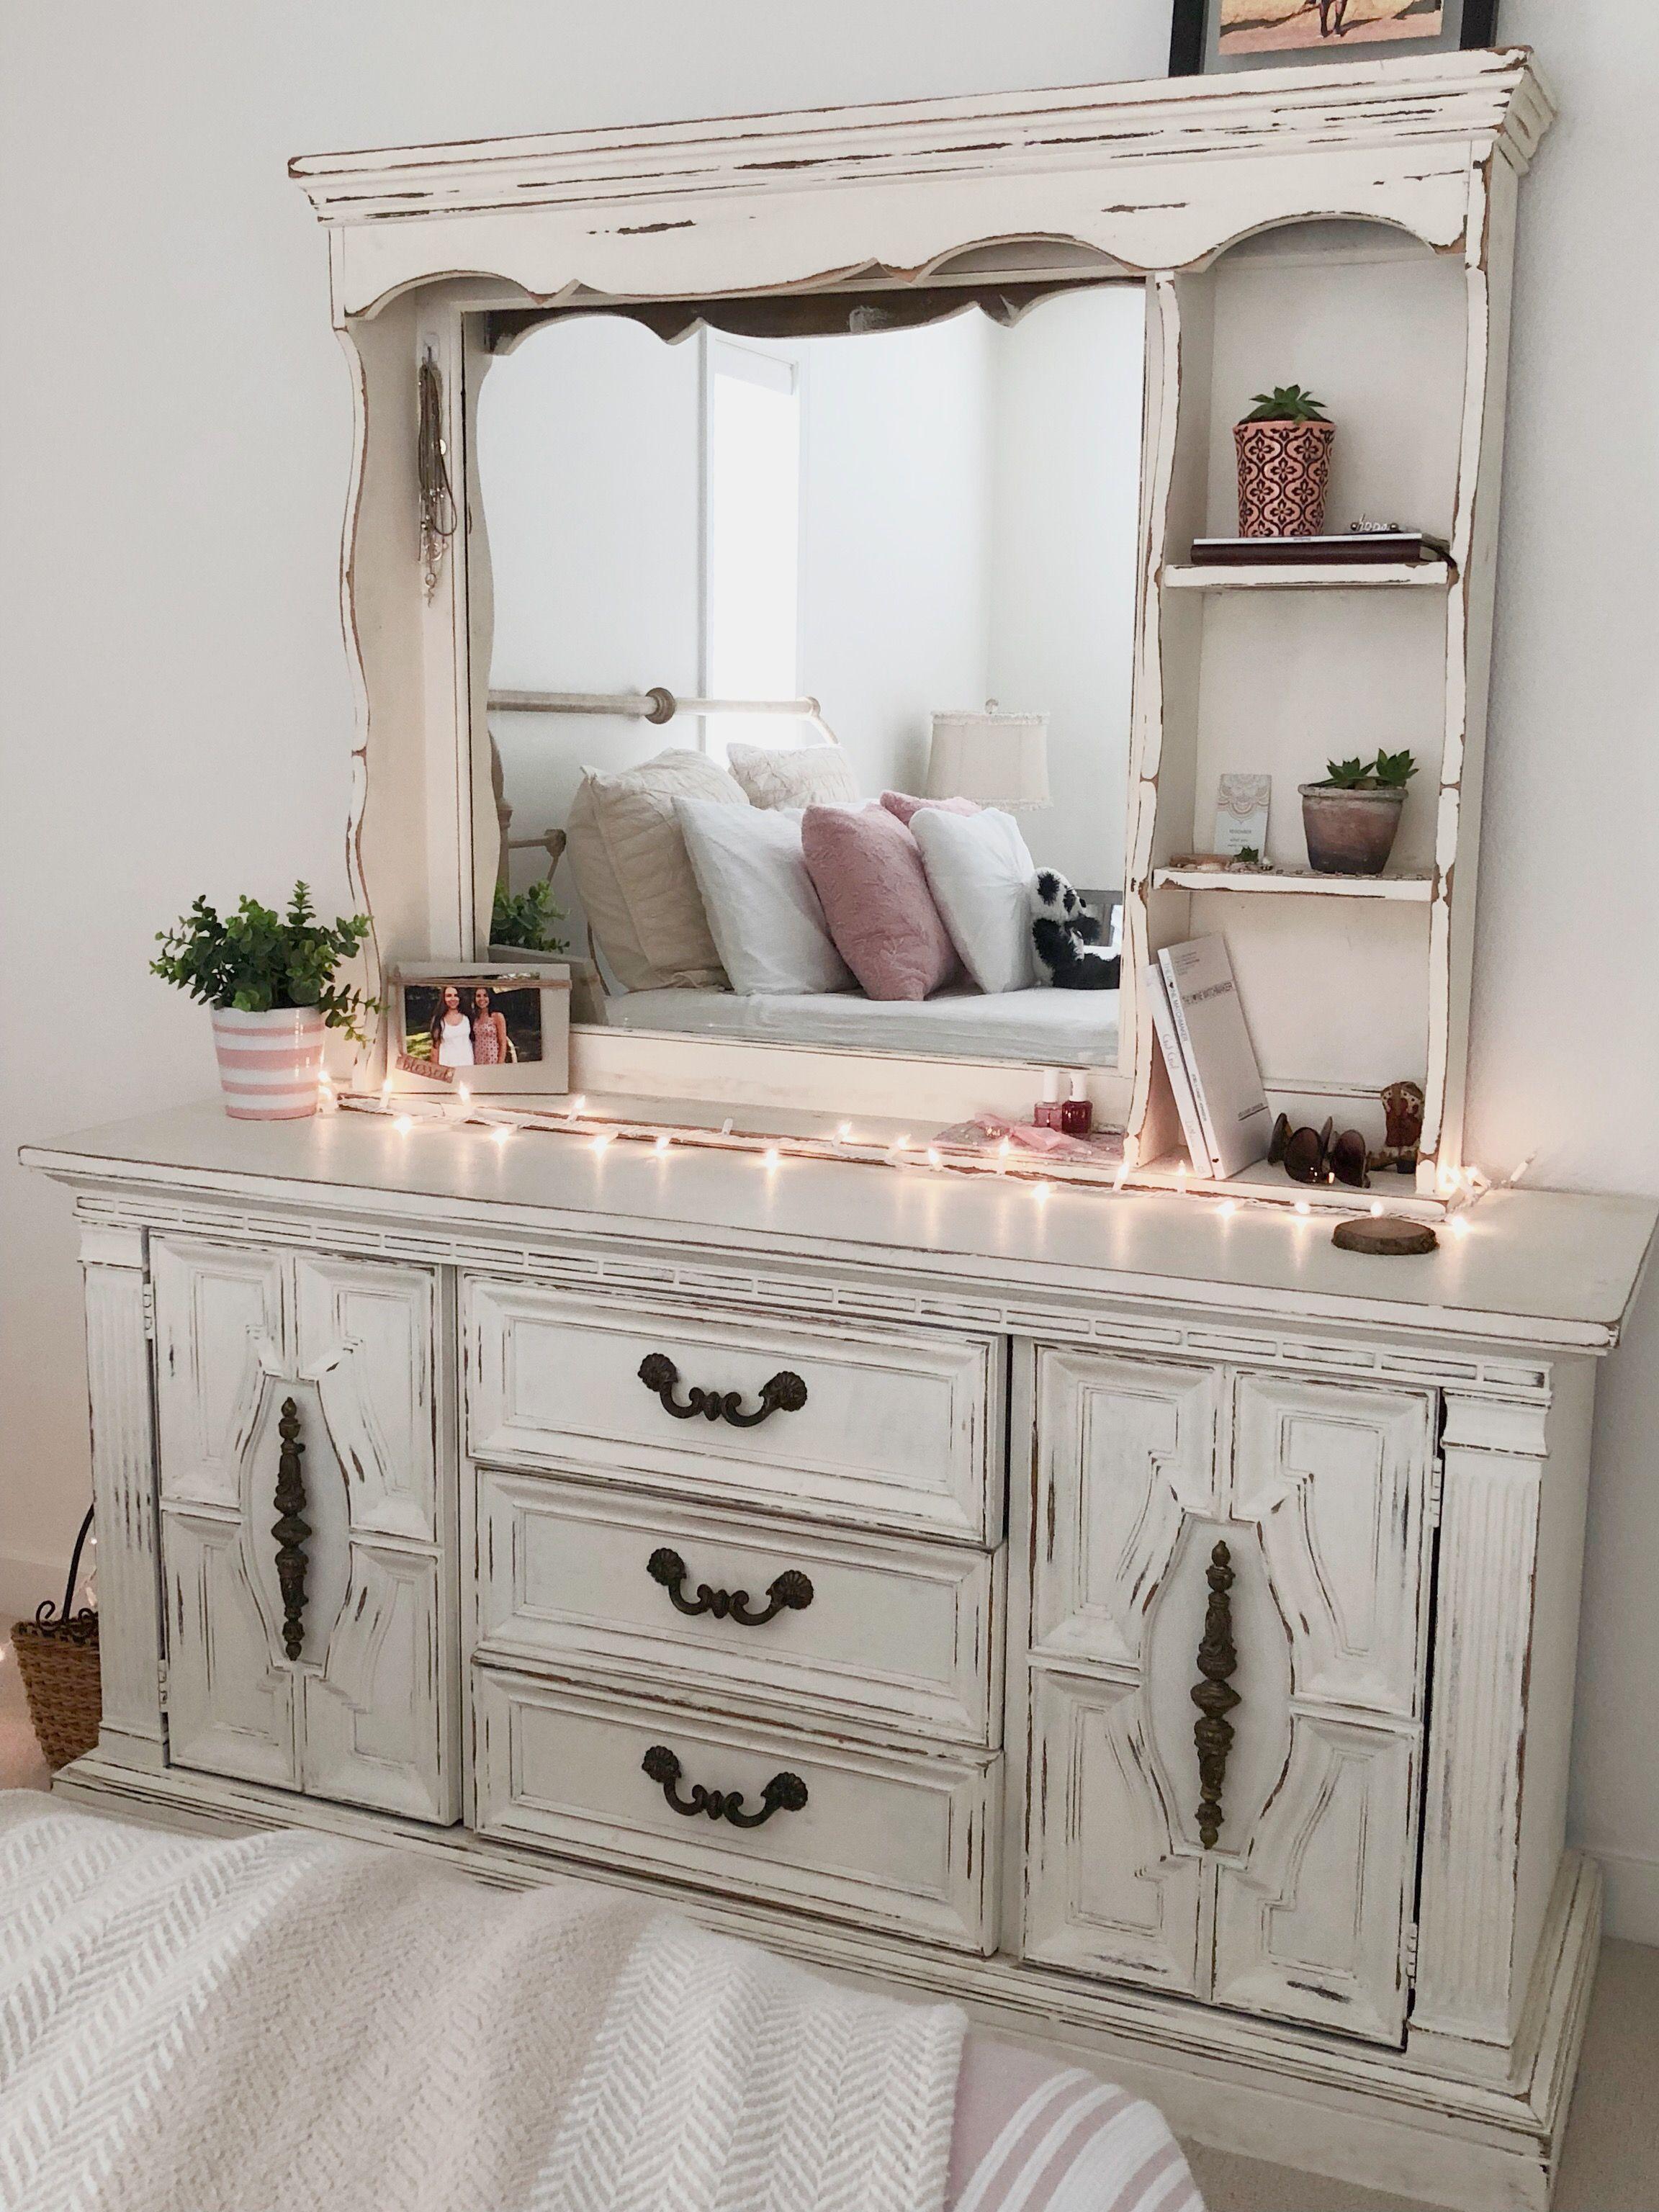 Park Art|My WordPress Blog_Vanity Dresser With Mirror And Lights